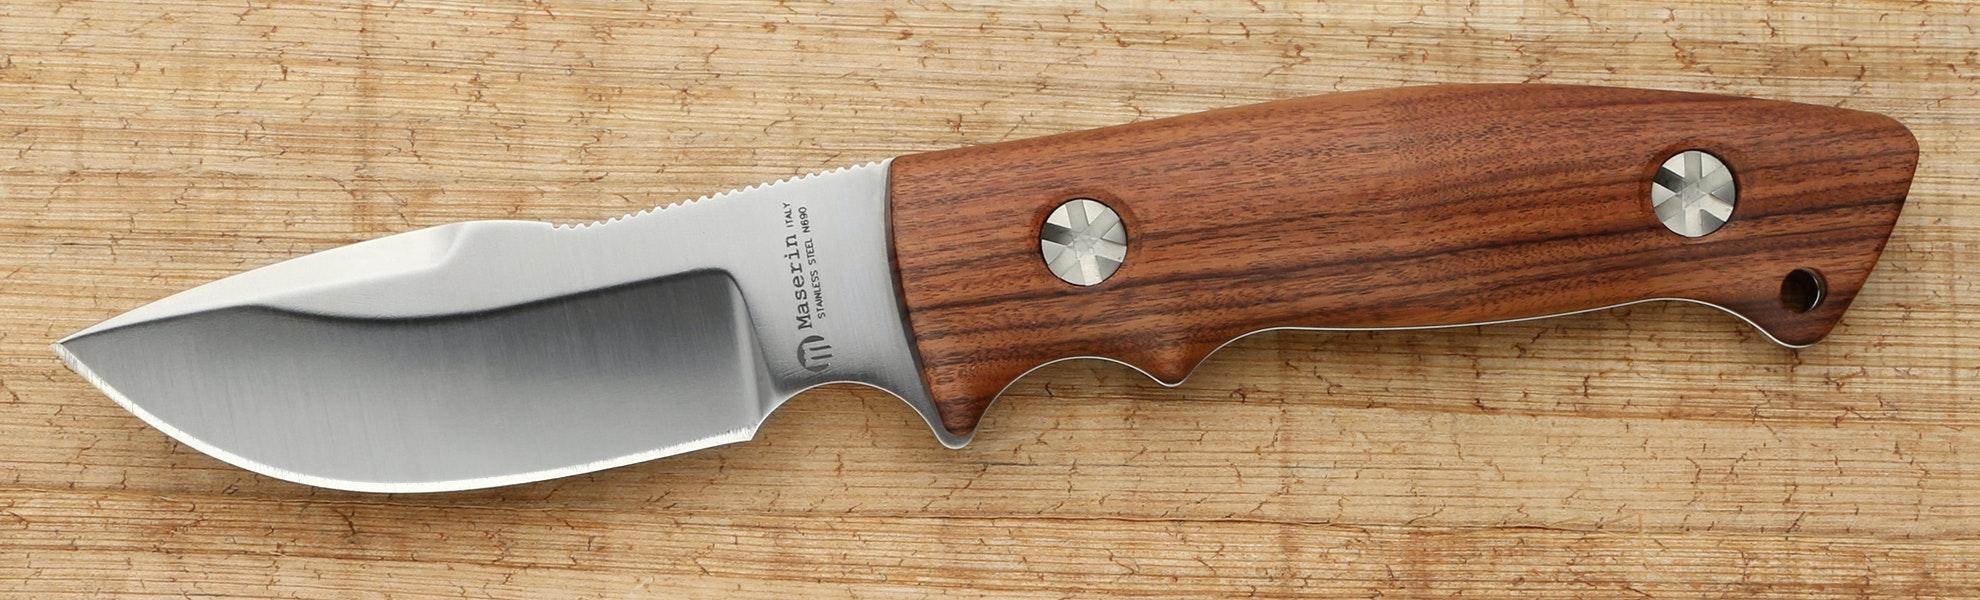 Maserin Hunter Fixed Blade Knife